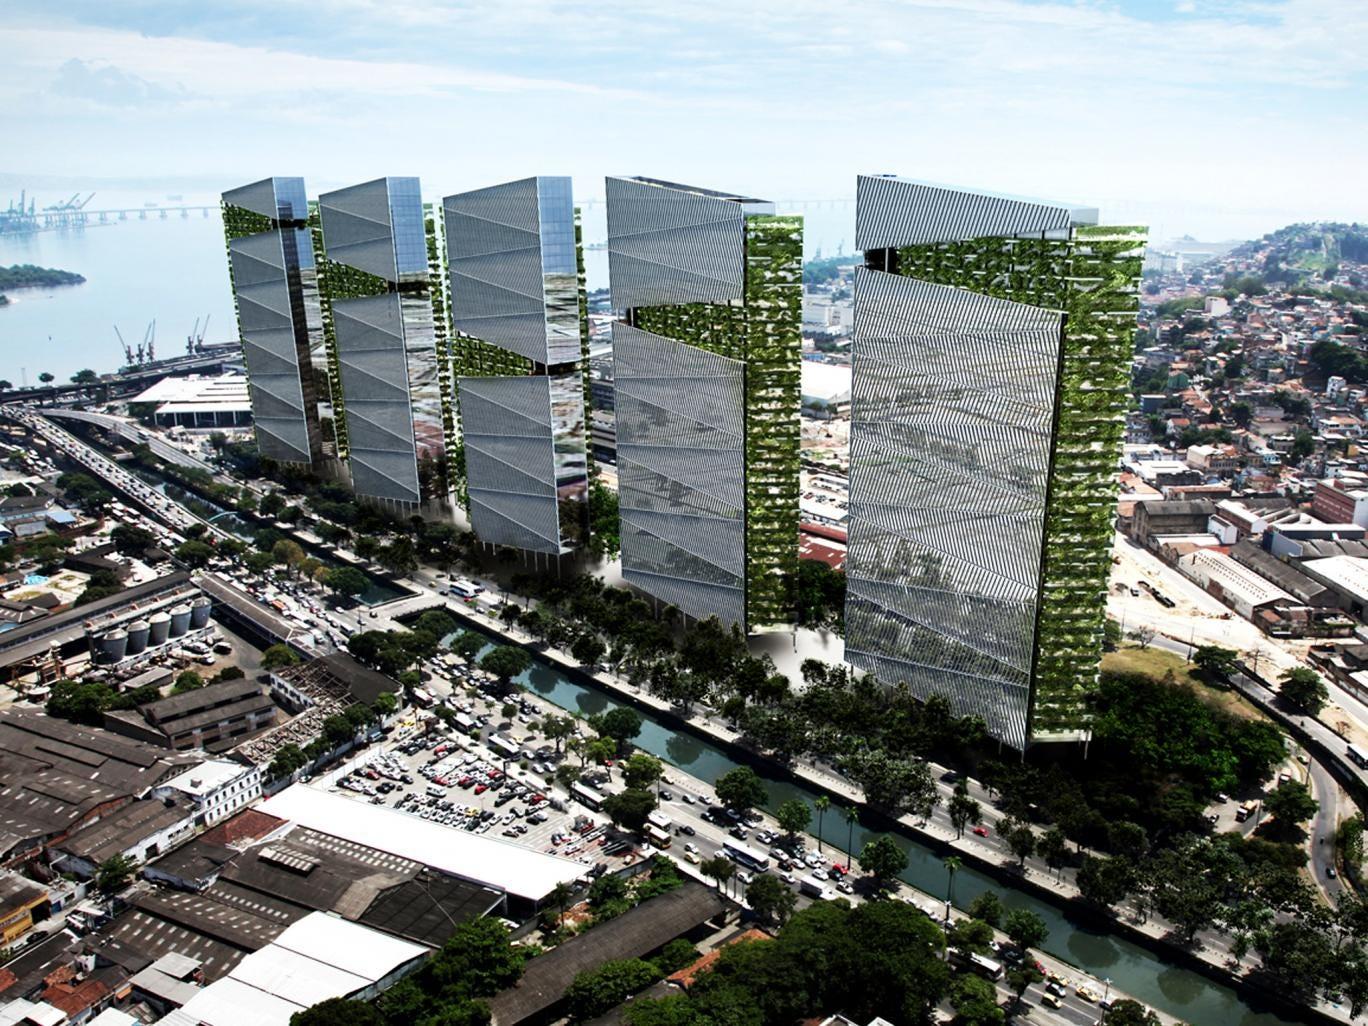 How Donald Trump's Rio venture will look